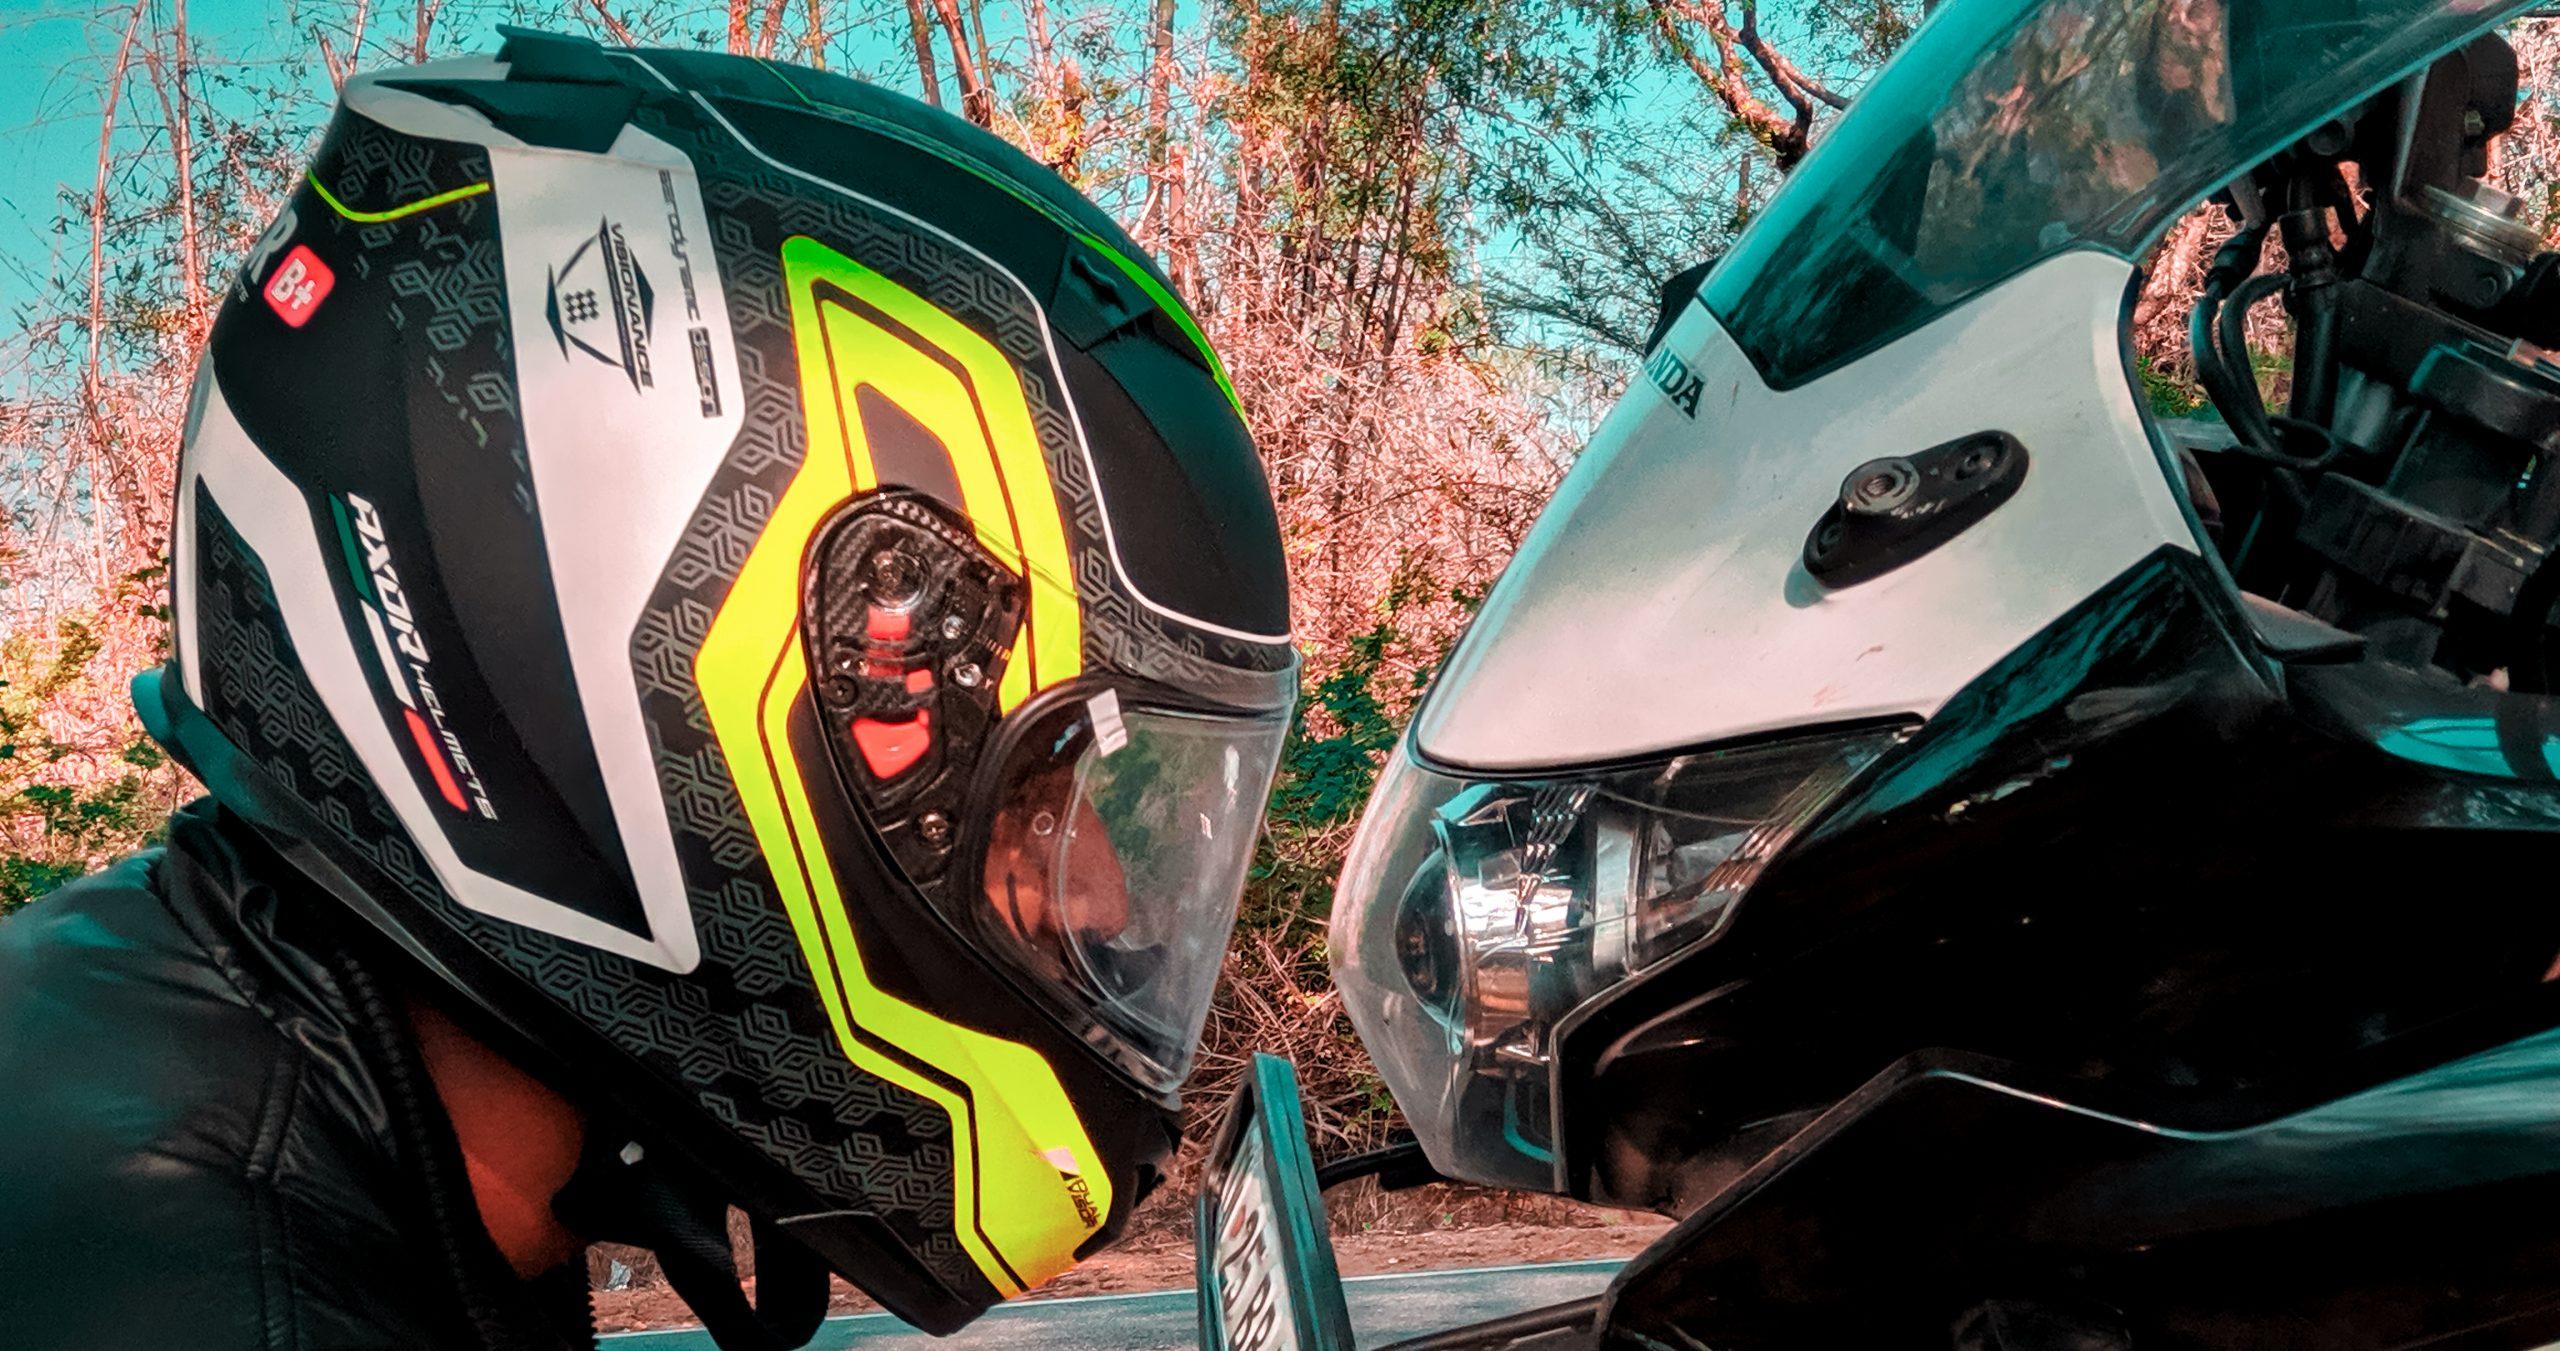 Helmet and headlight